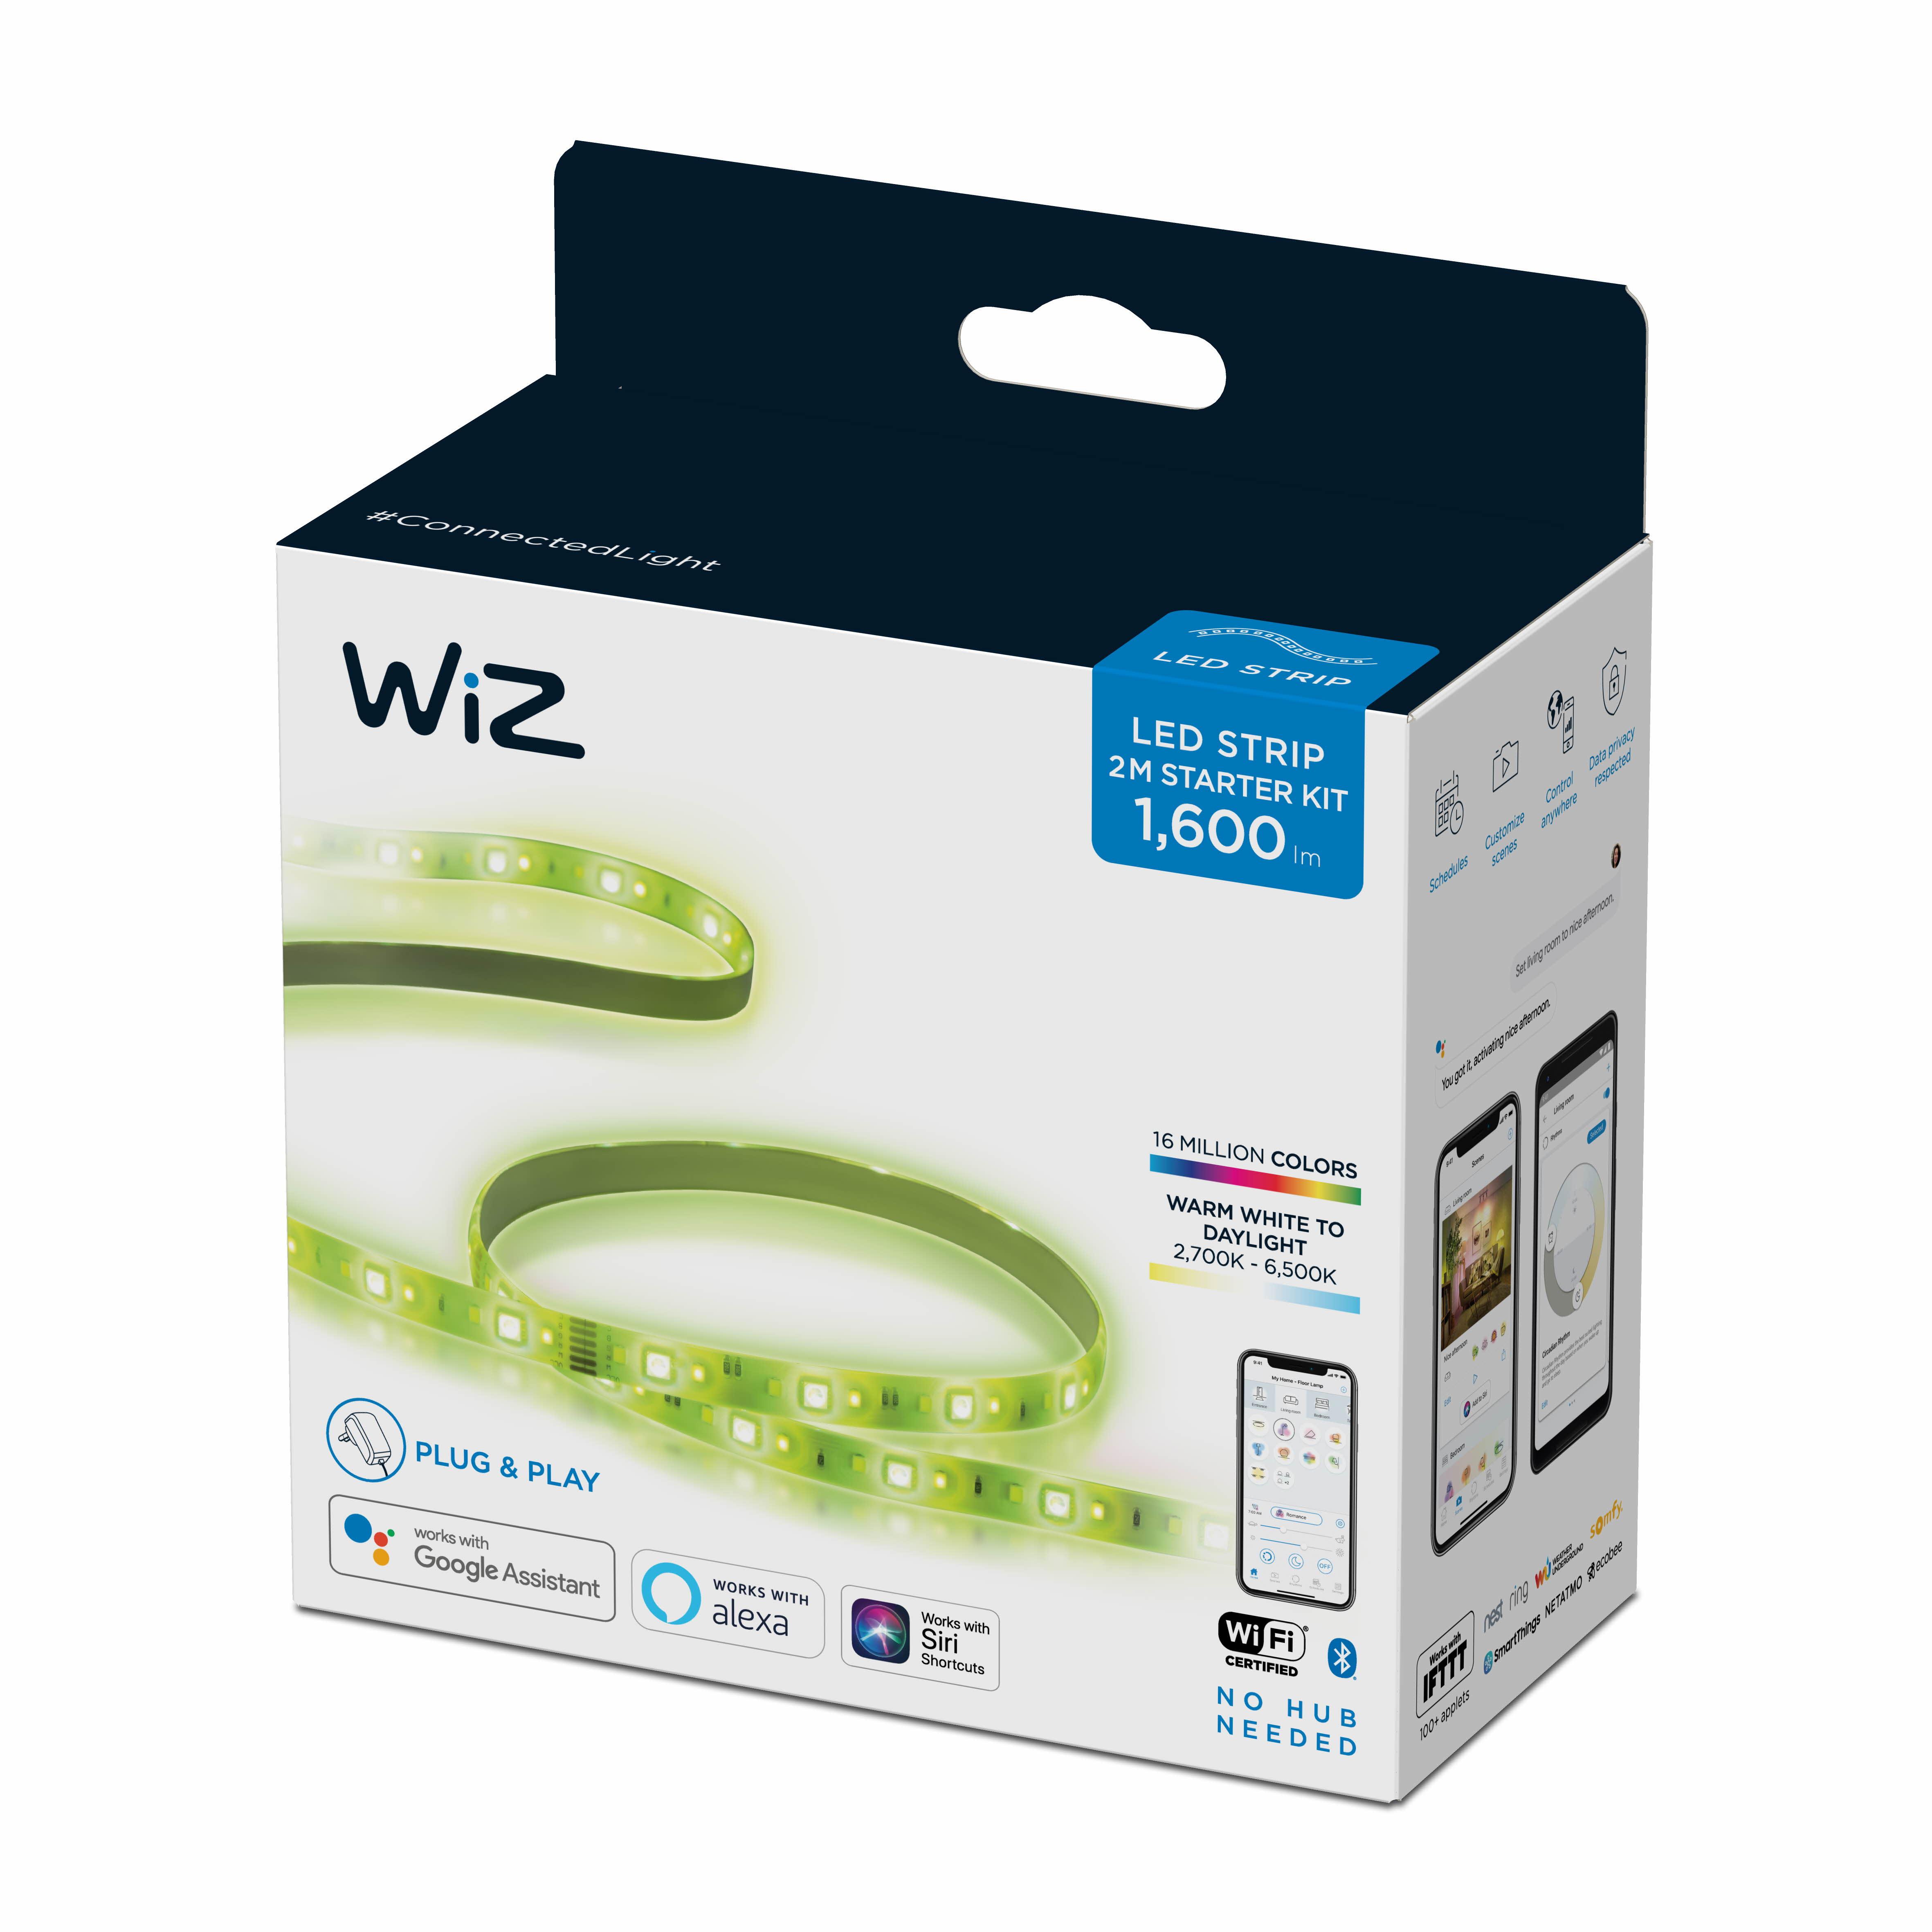 WiZ -Wi-Fi LEDStrip 2M 1600lm StarterKit